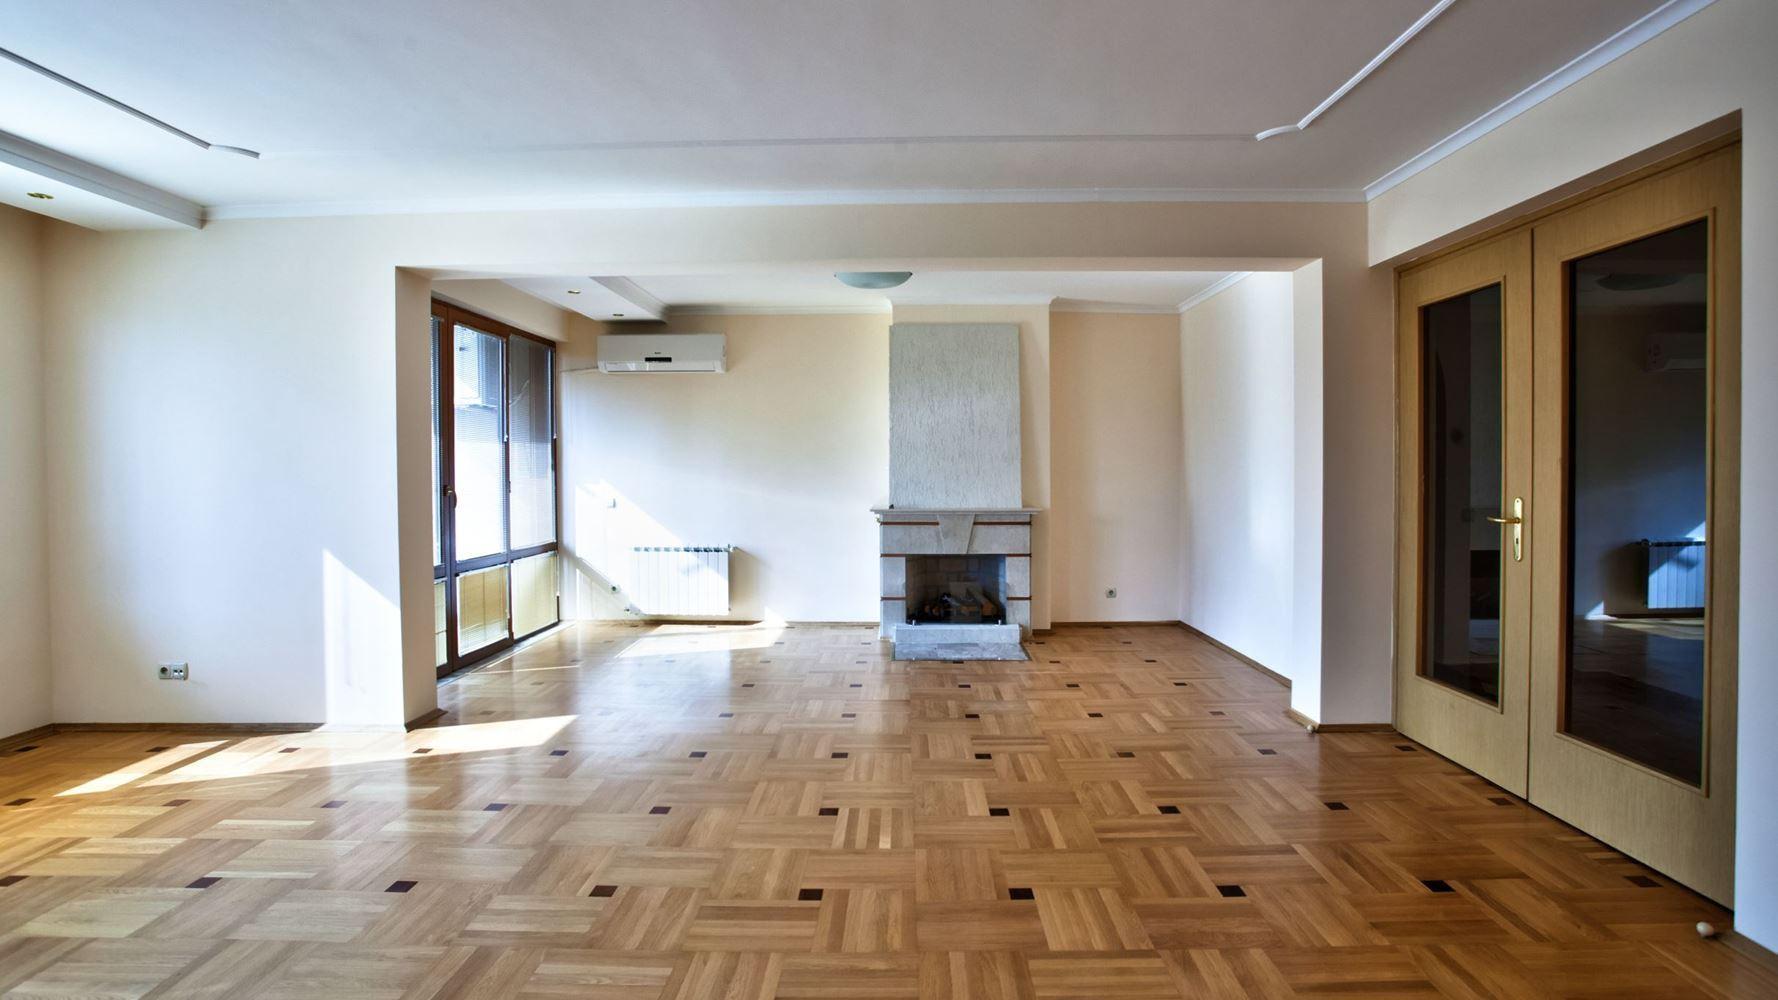 4-bedroom Apartment for Rent, Reduta